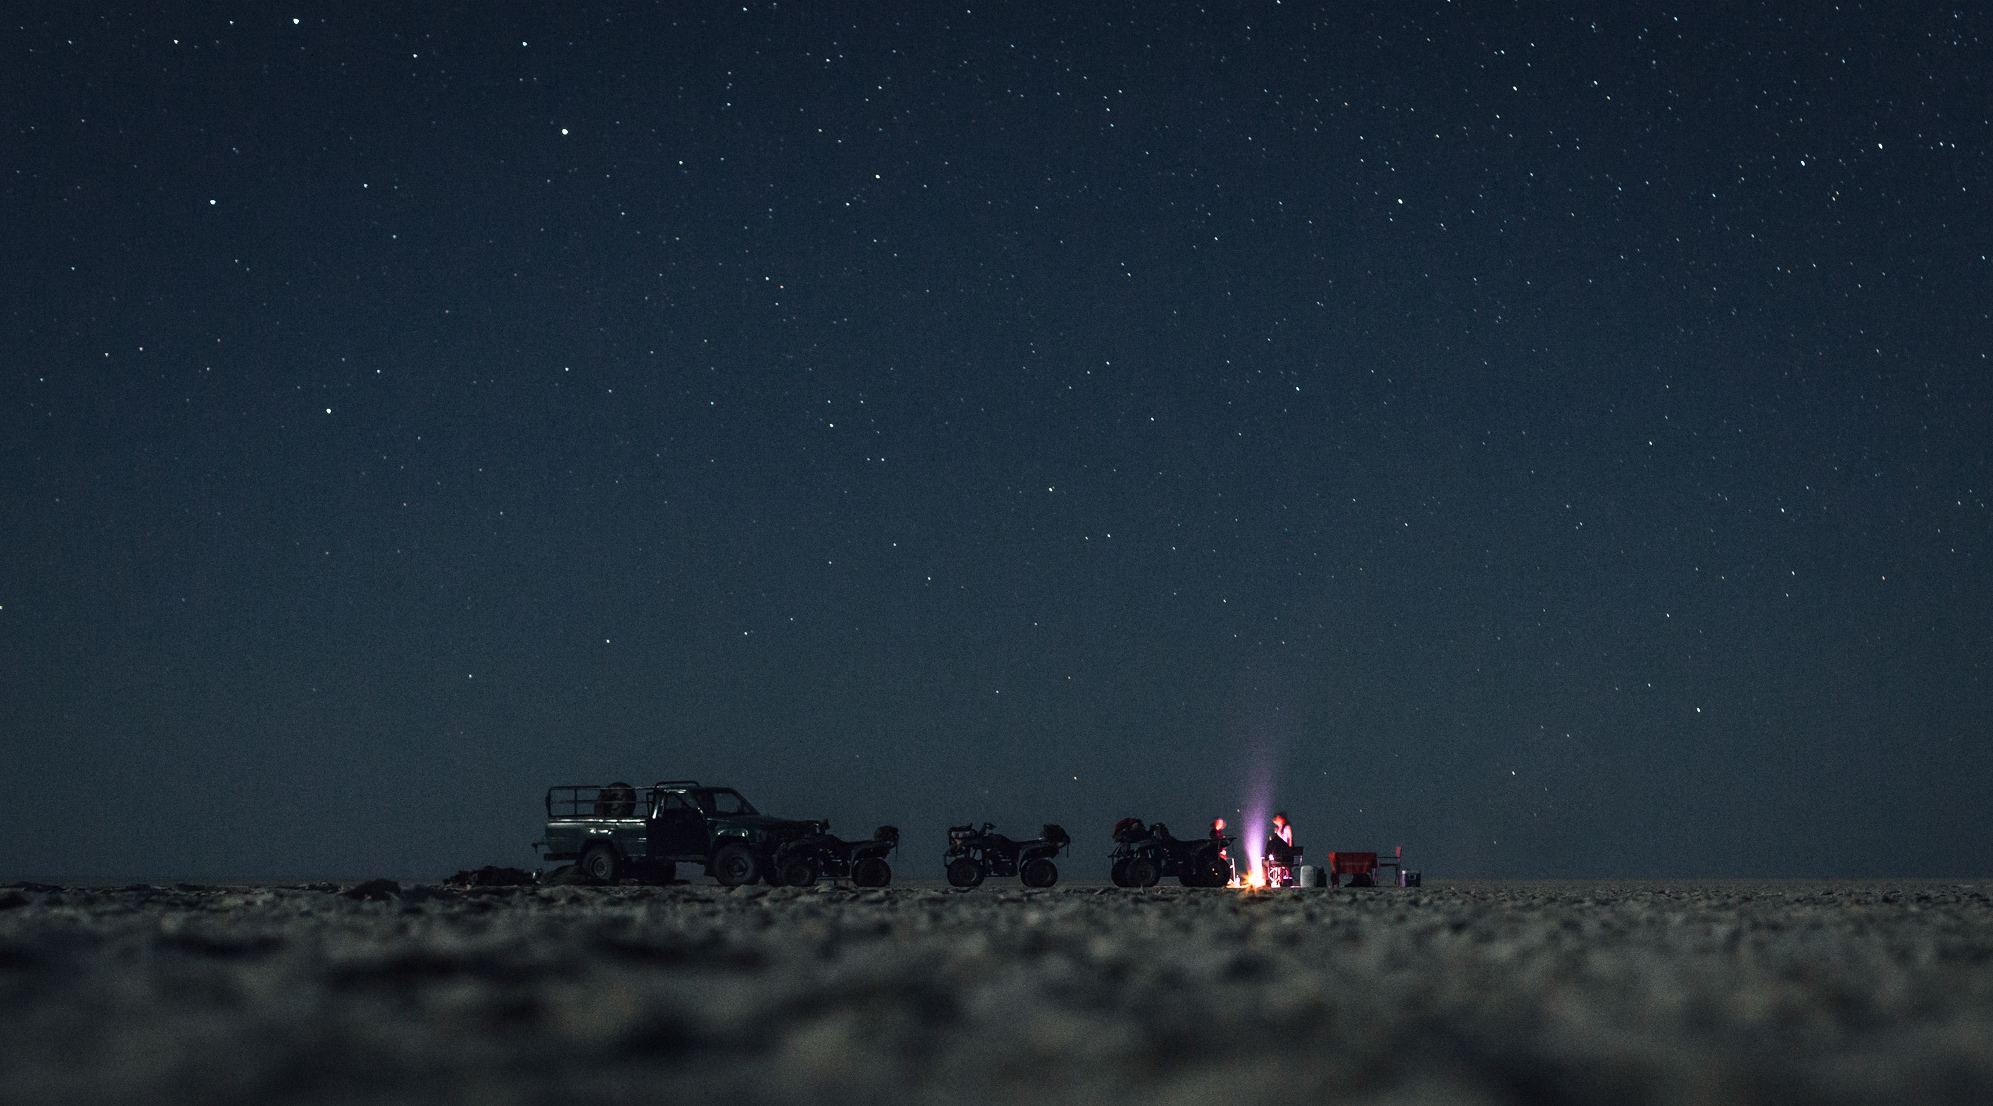 #NPRNightSky: Your Star-Studded Pix From The World's Inkiest Skies